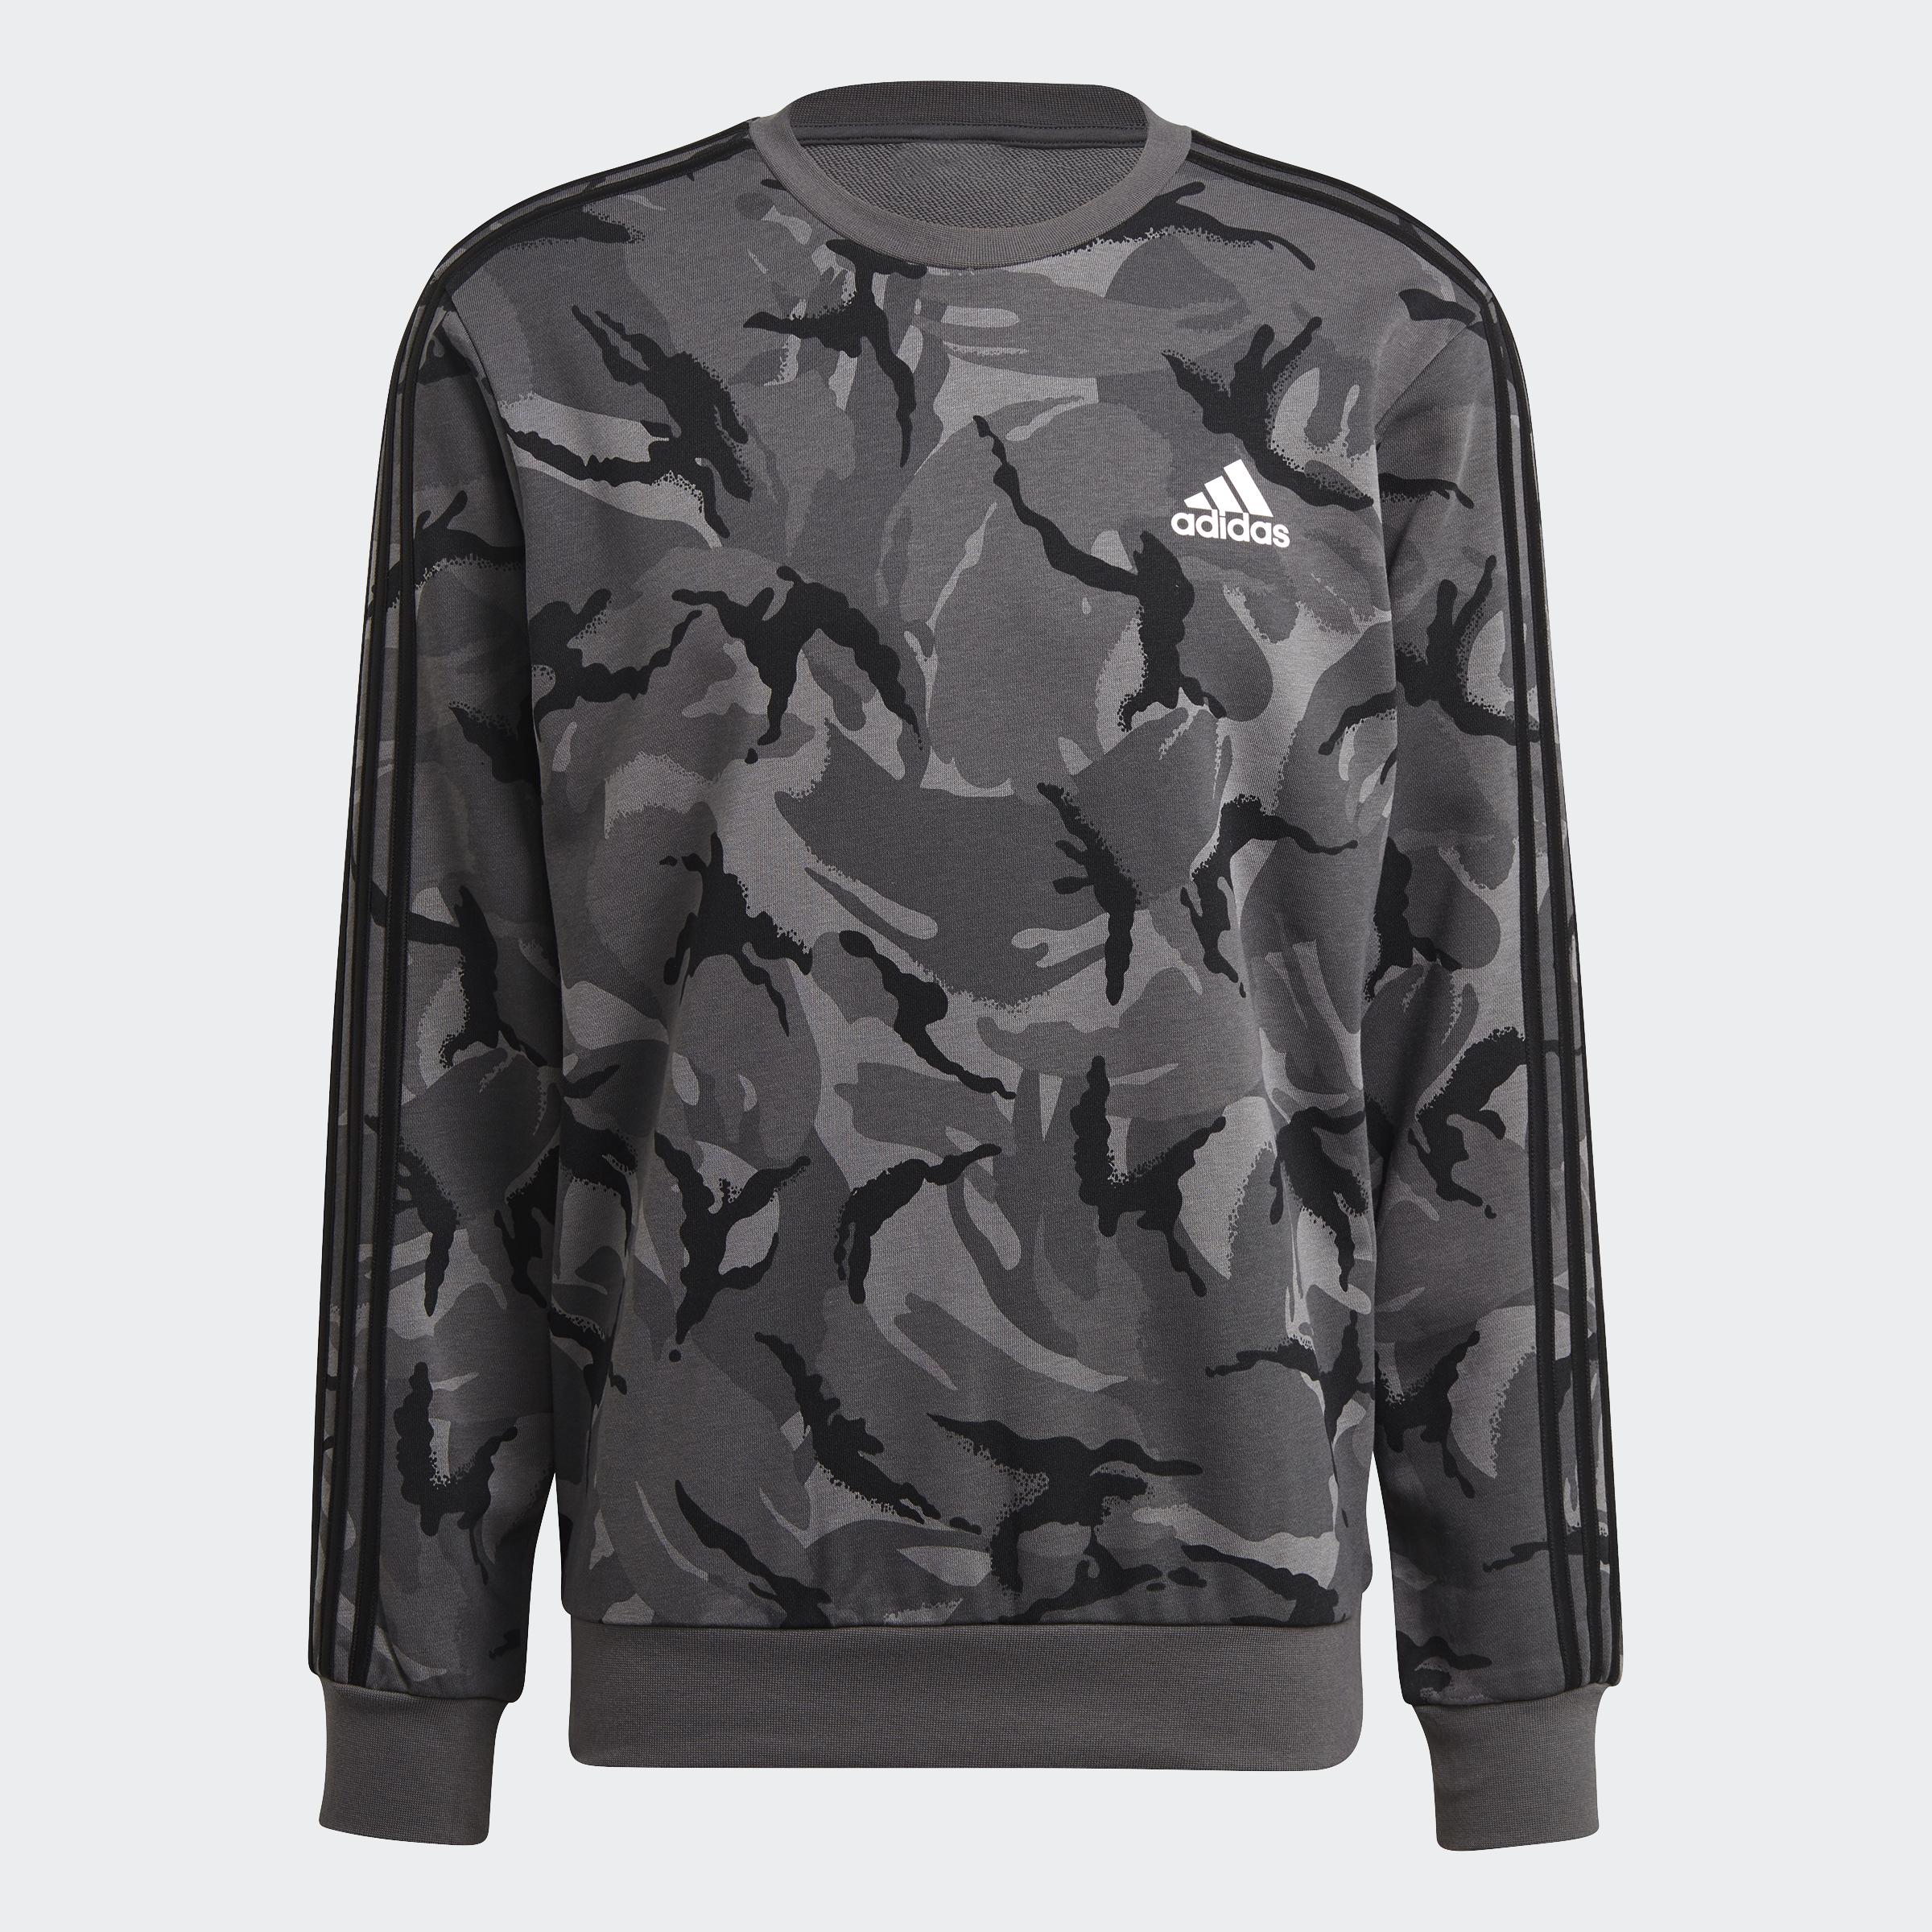 thumbnail 14 - adidas Essentials Camouflage Crew Sweatshirt Men's Sweatshirts